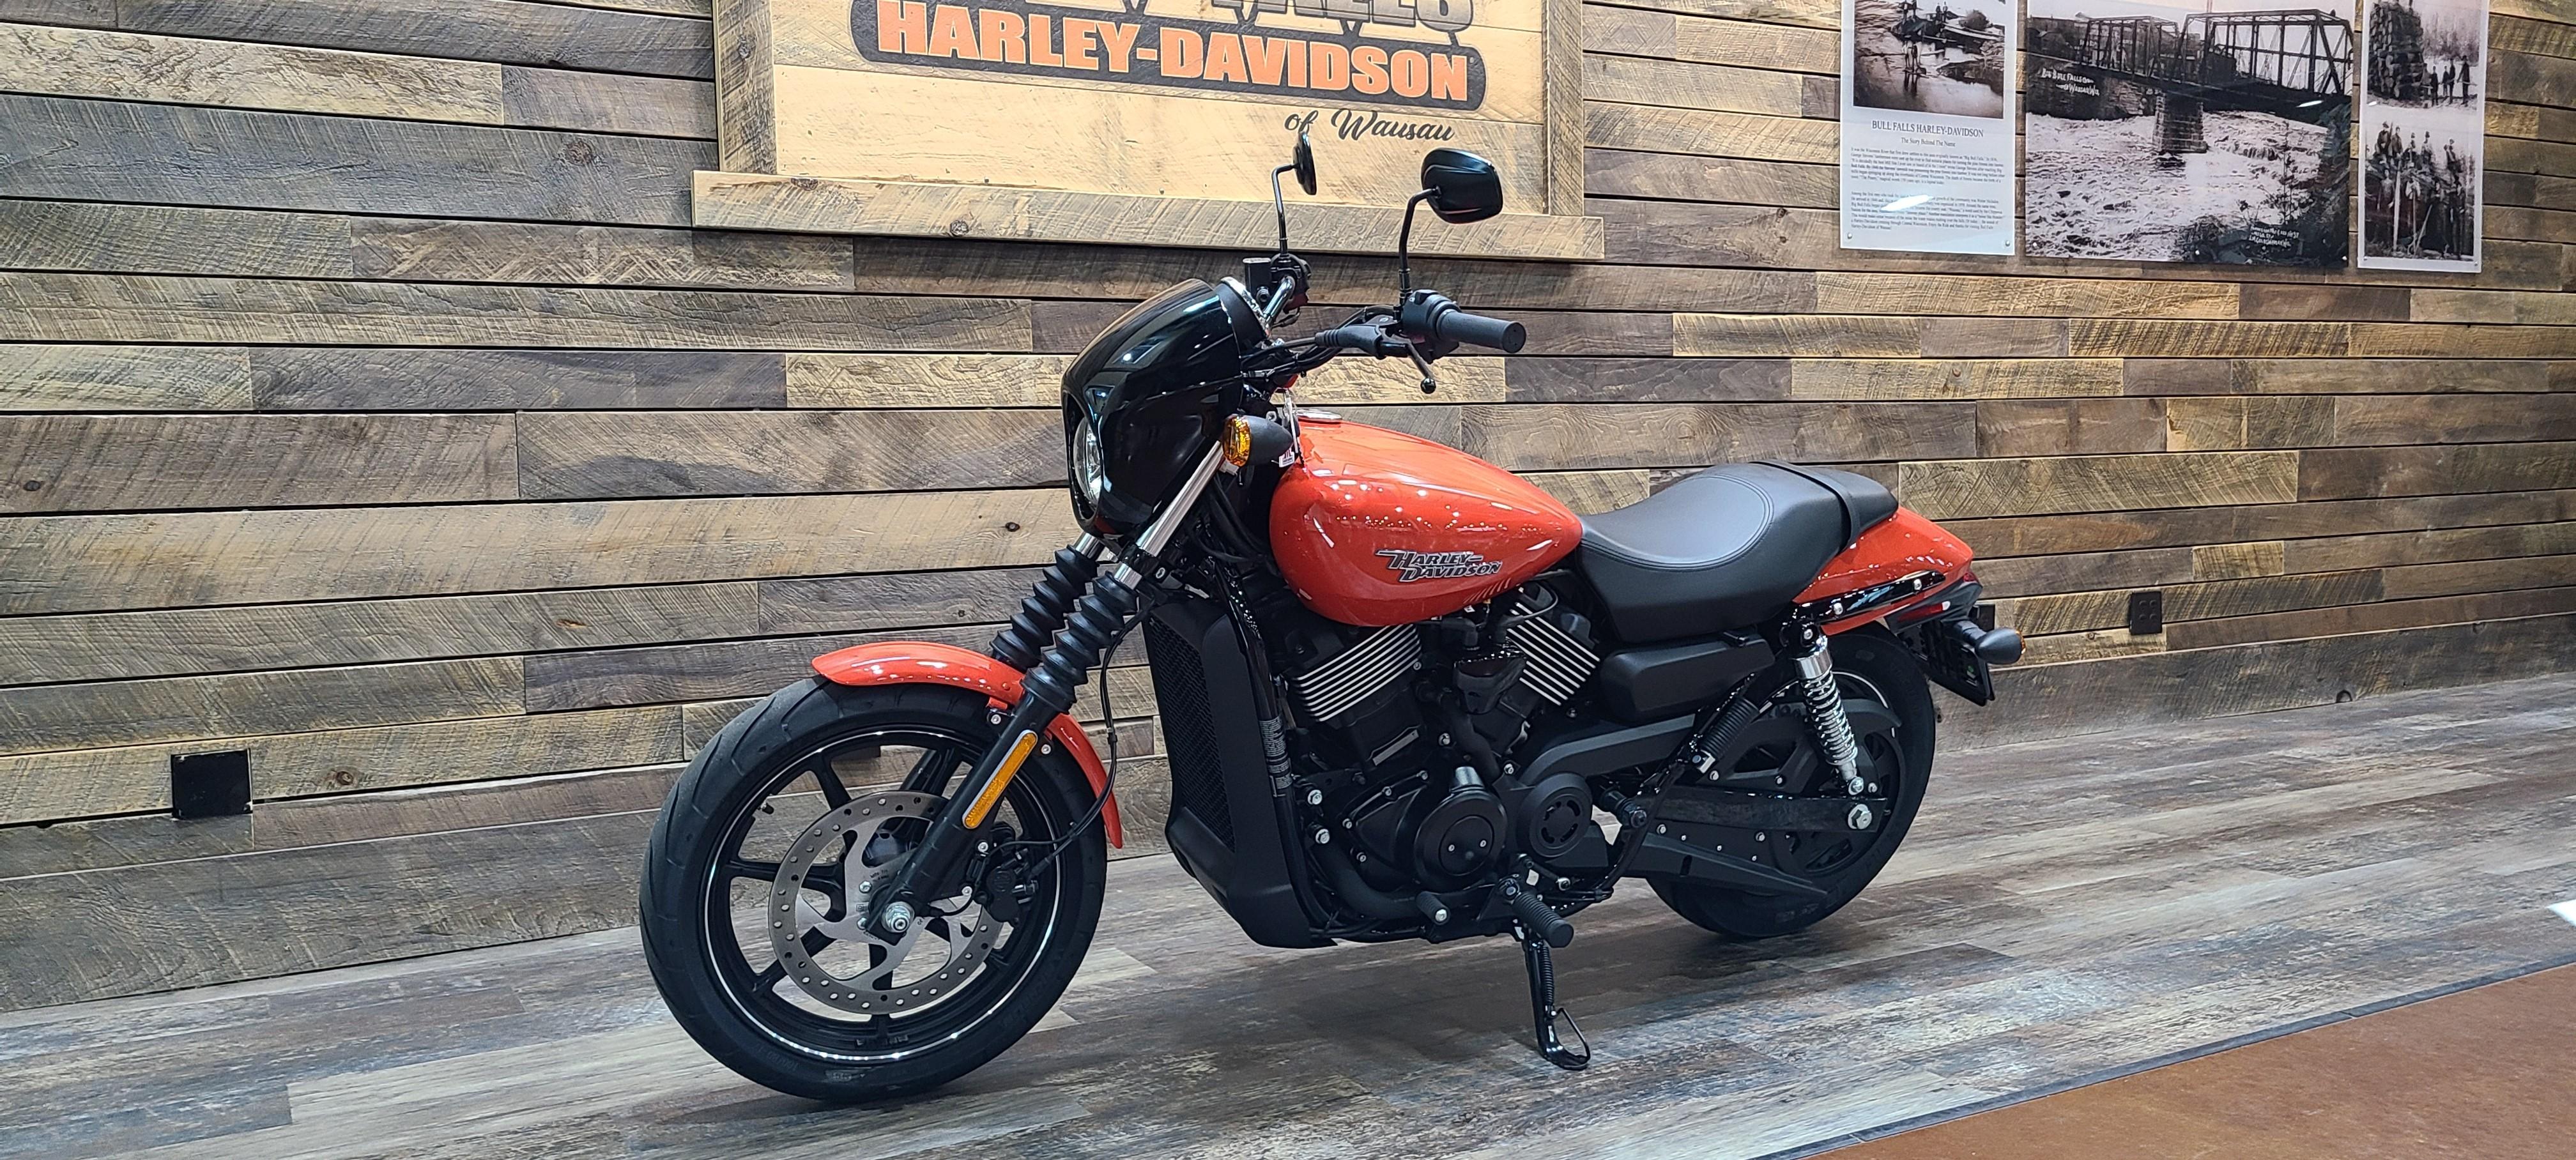 2020 Harley-Davidson Street Street 750 at Bull Falls Harley-Davidson